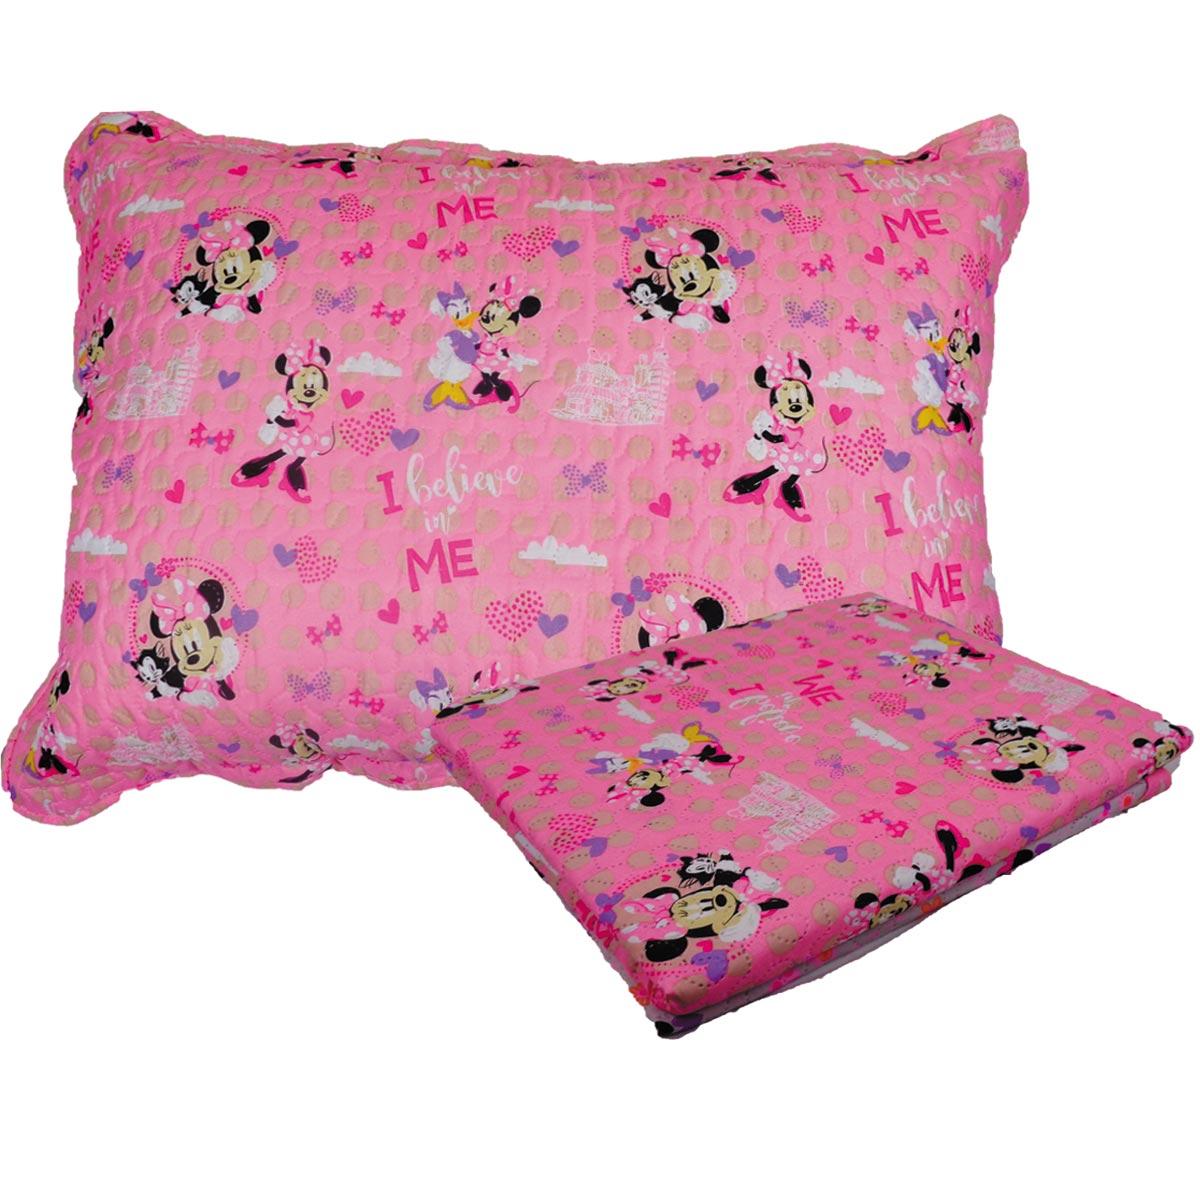 Colcha Infantil Minnie Mouse Menina Solteiro Ultrasonic Jolitex